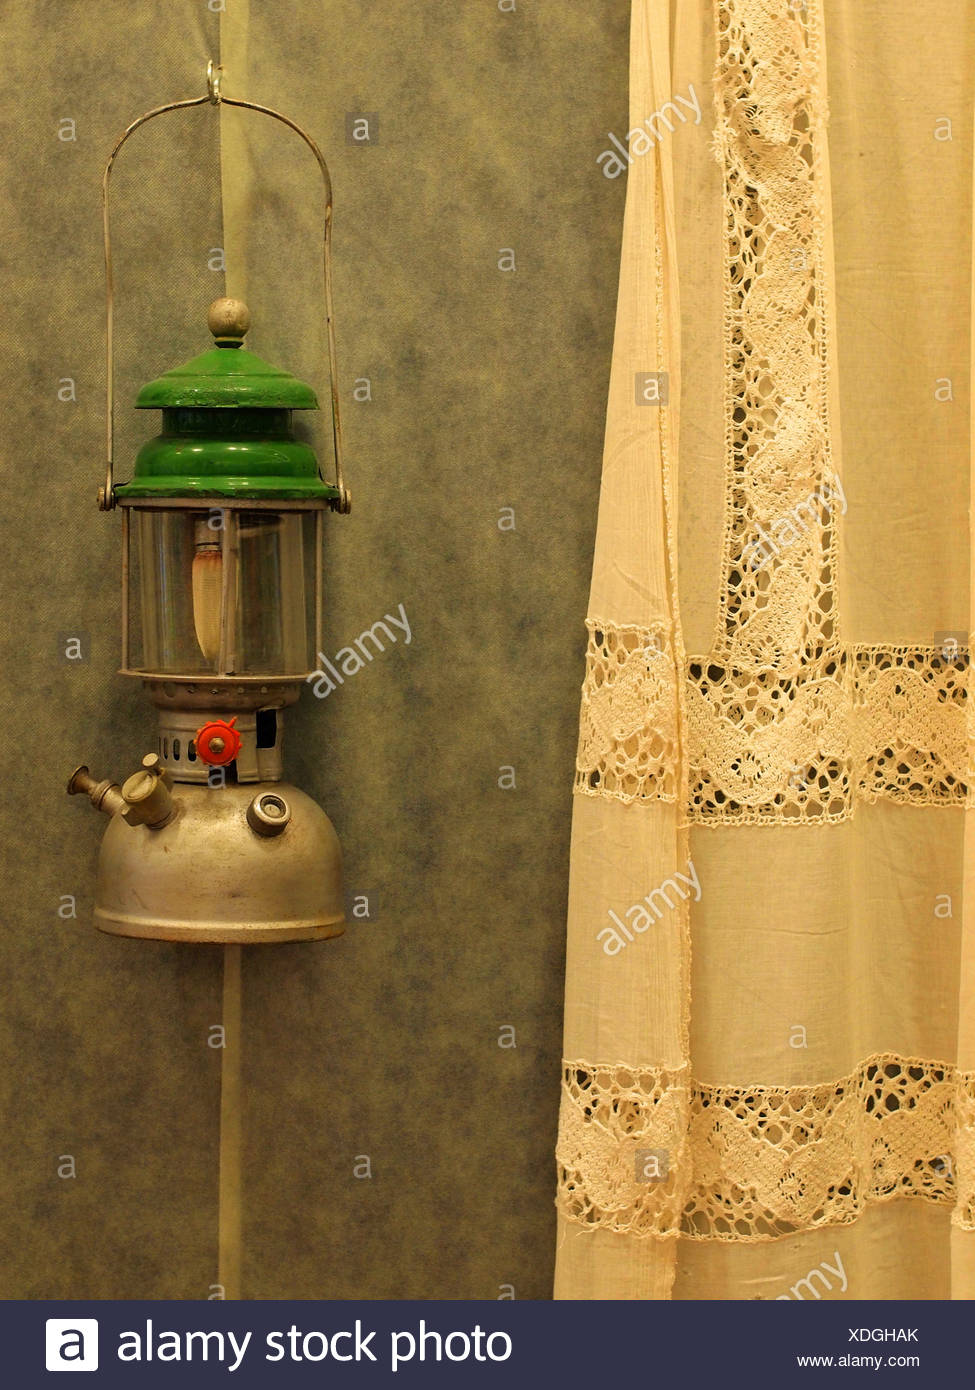 Old Kerosene lamp - Stock Image